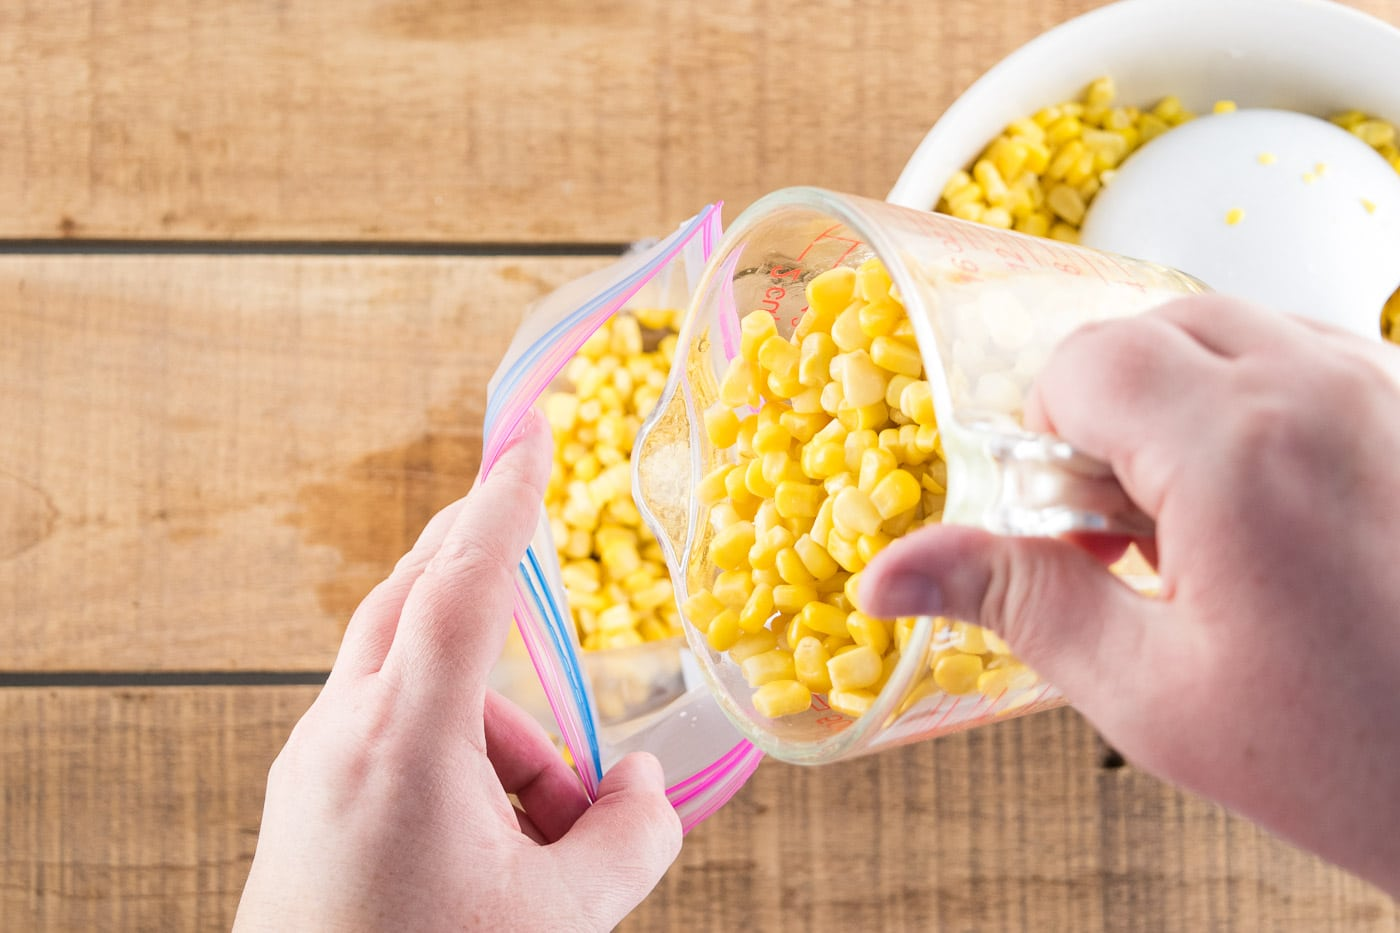 Measuring sweet corn into freezer bags.